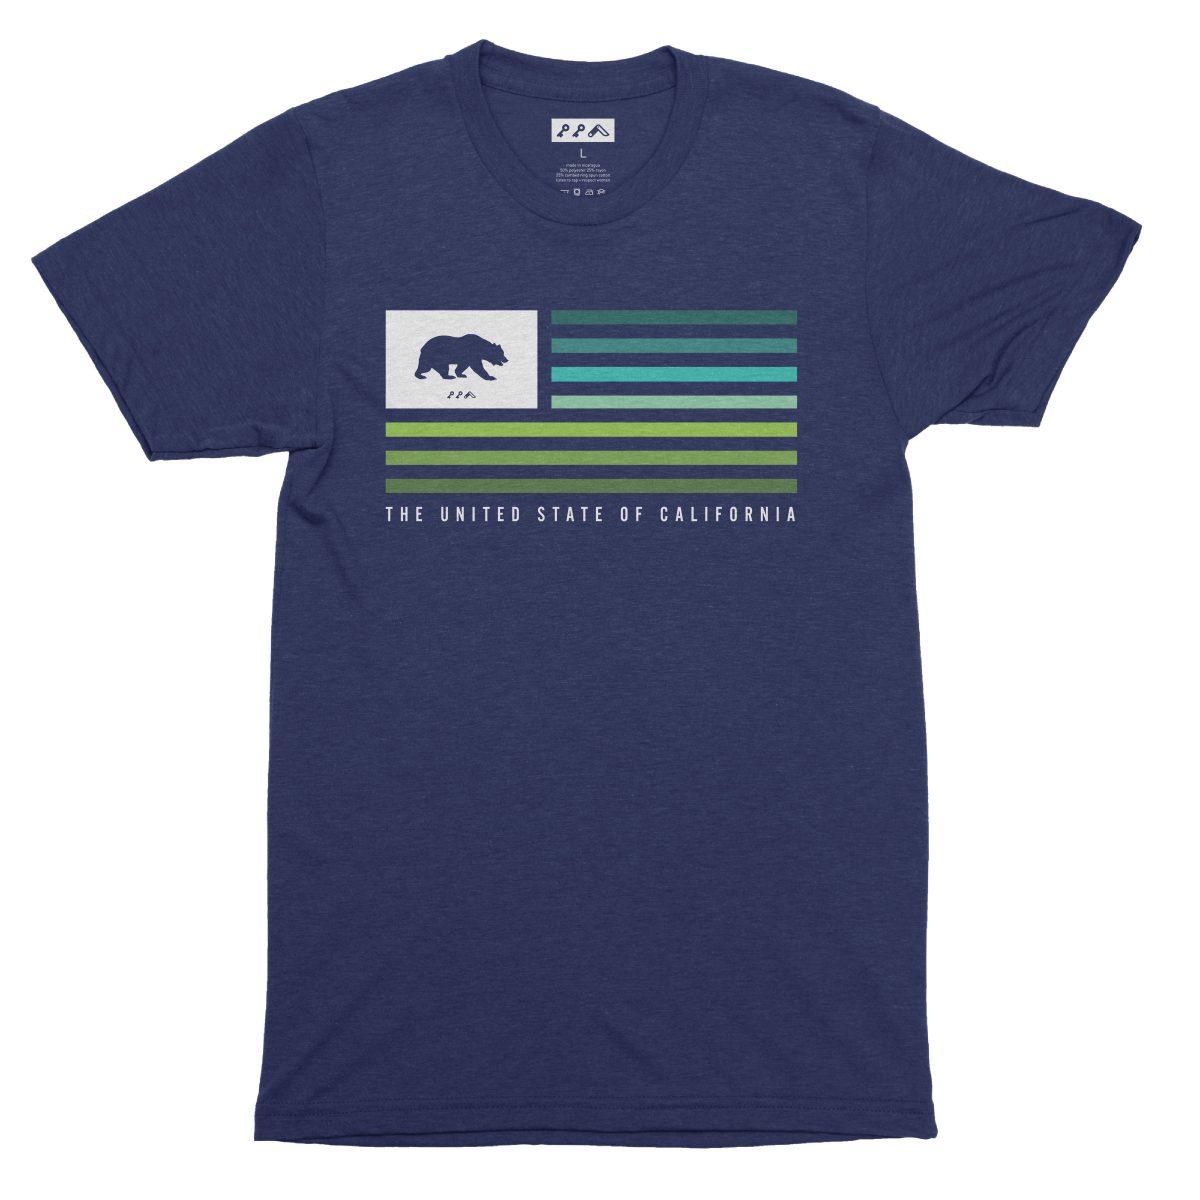 UNITED STATE OF CALIFORNIA music festival summer beach tshirt in navy